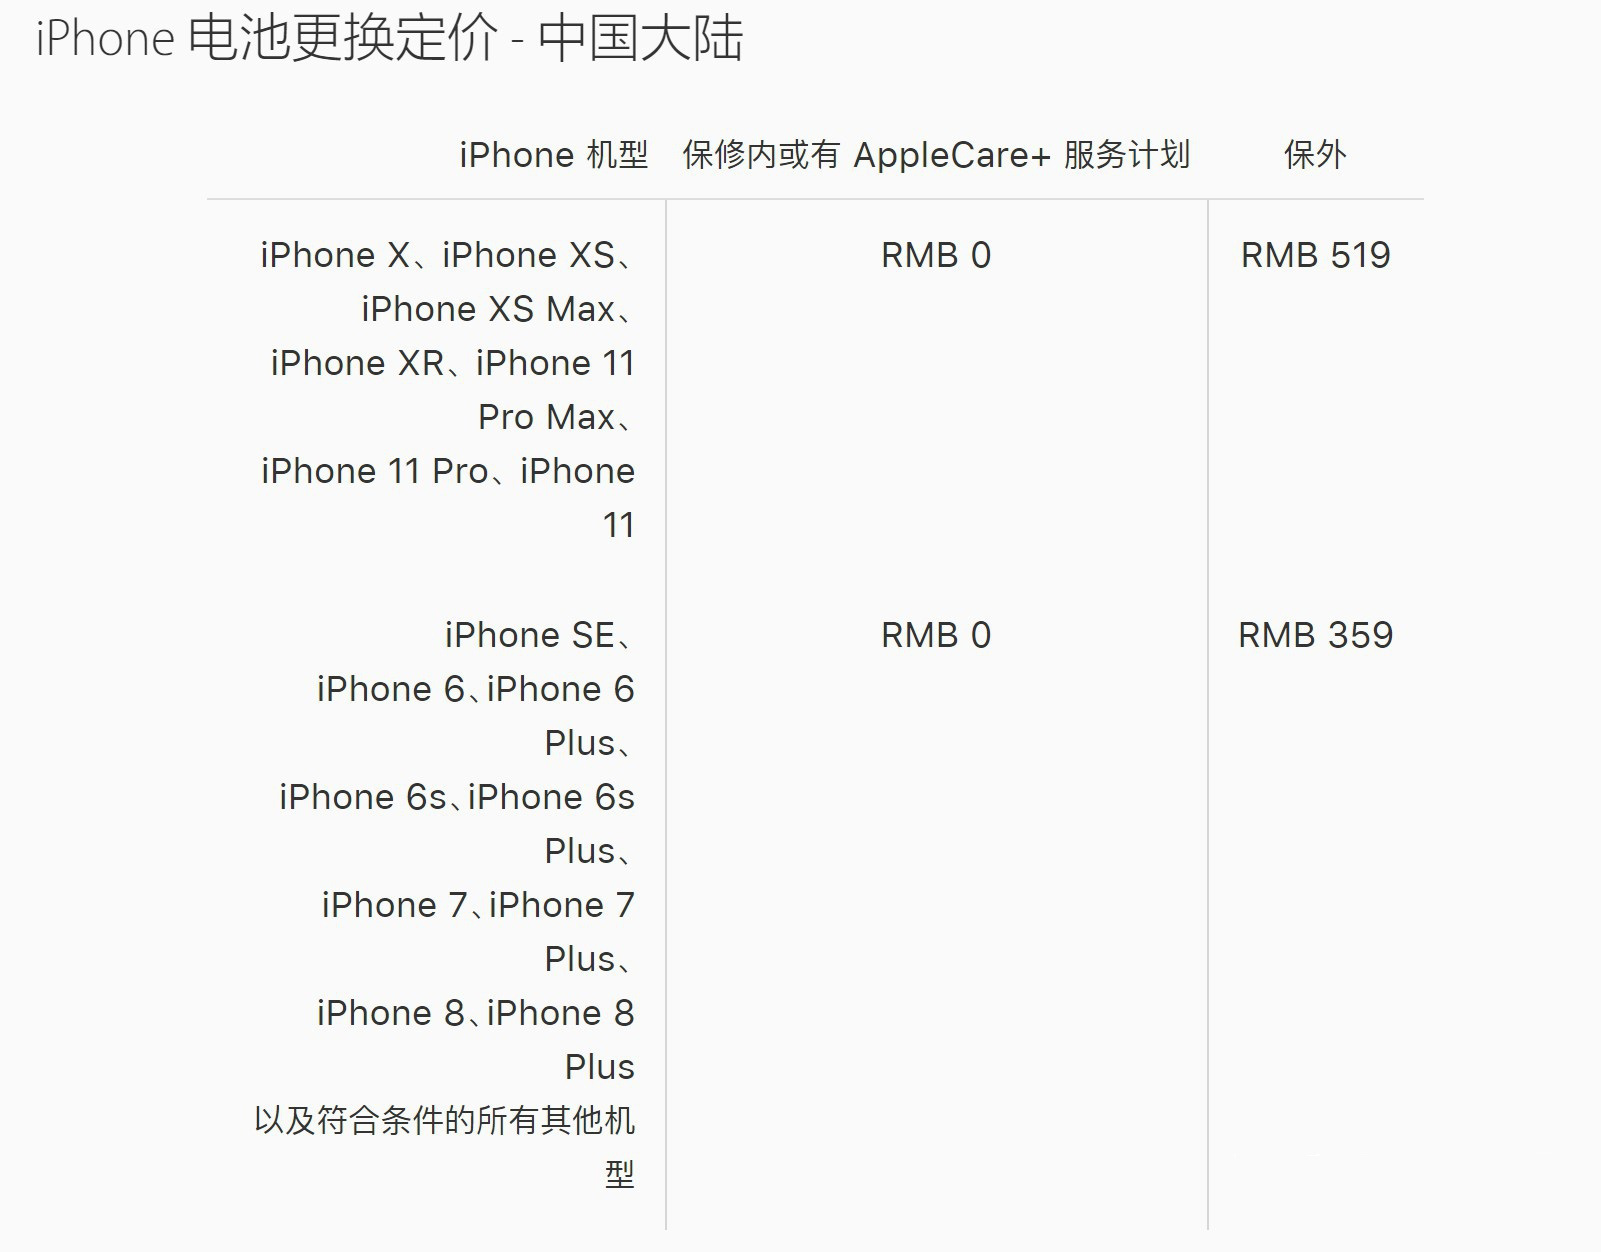 AppleCare+ 服务是个坑吗?是否值得购买?